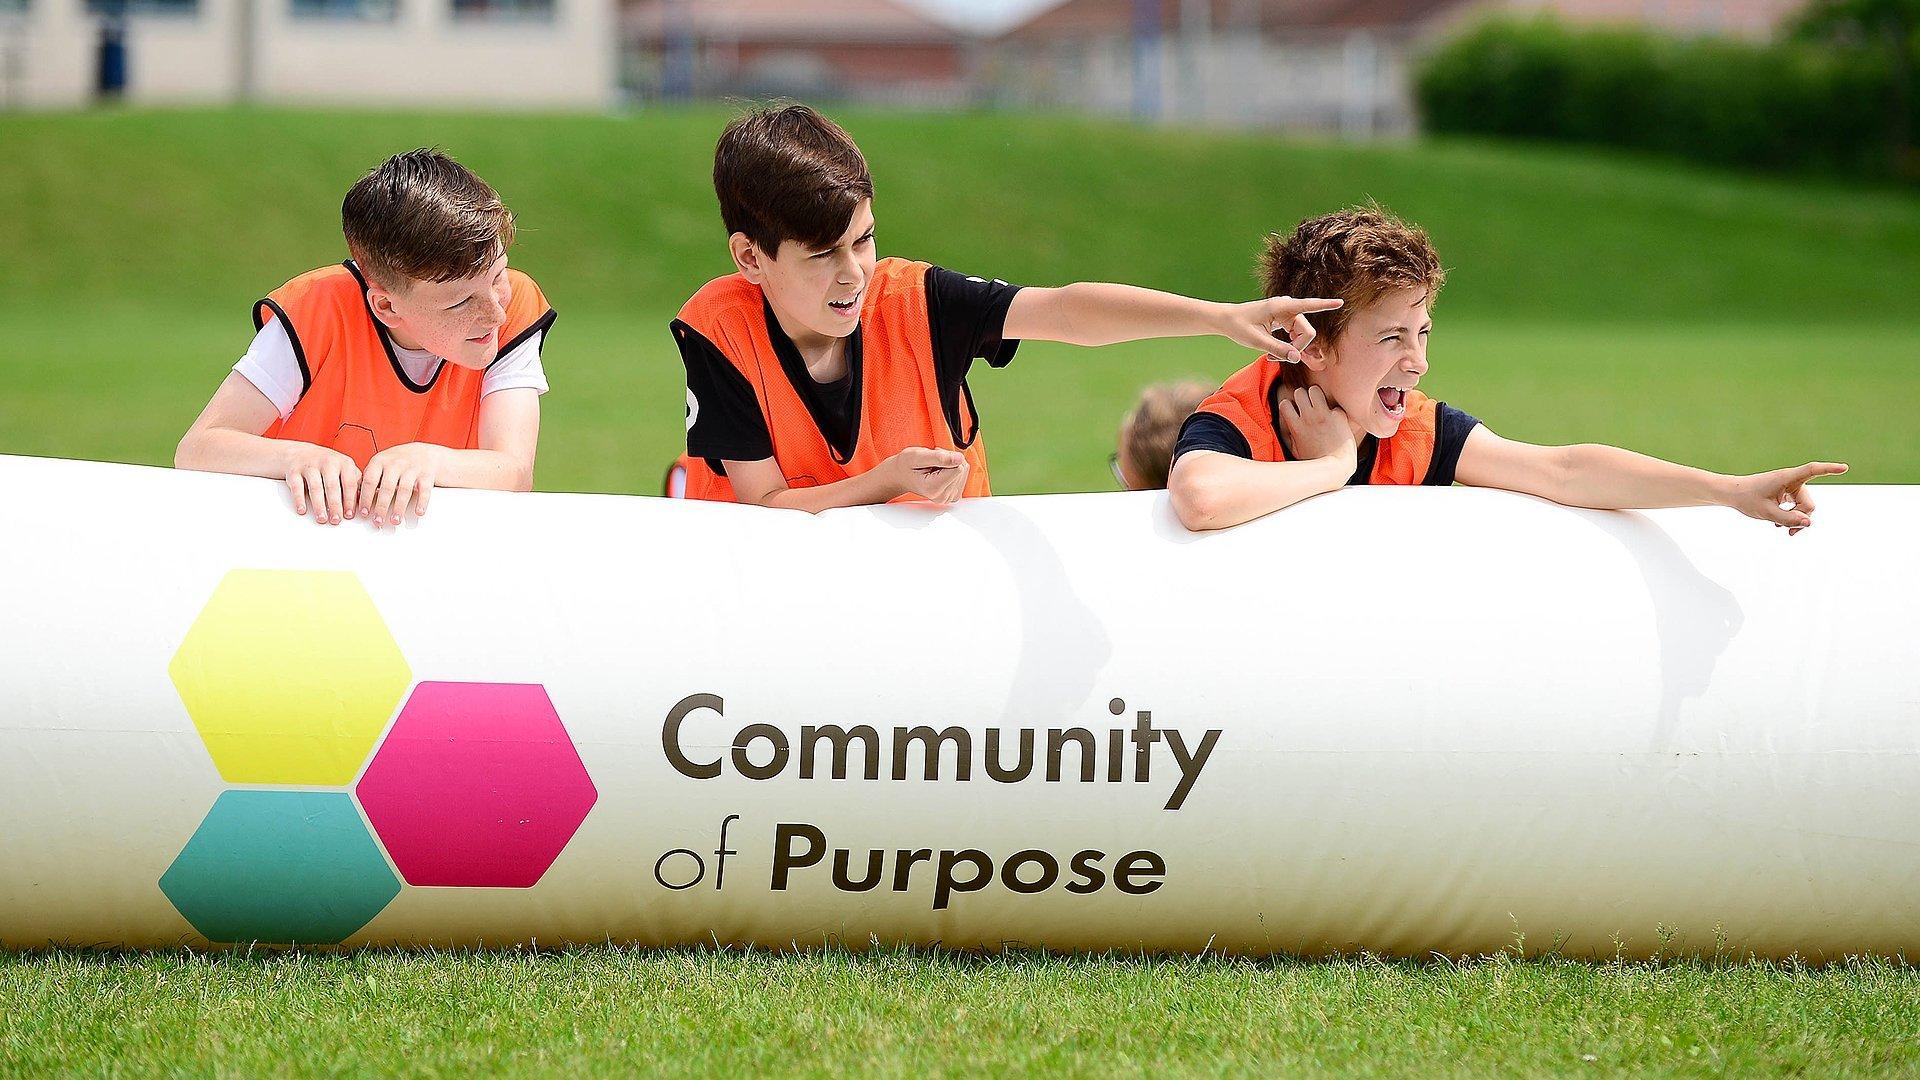 Bristol Business People Feature Community of Purpose